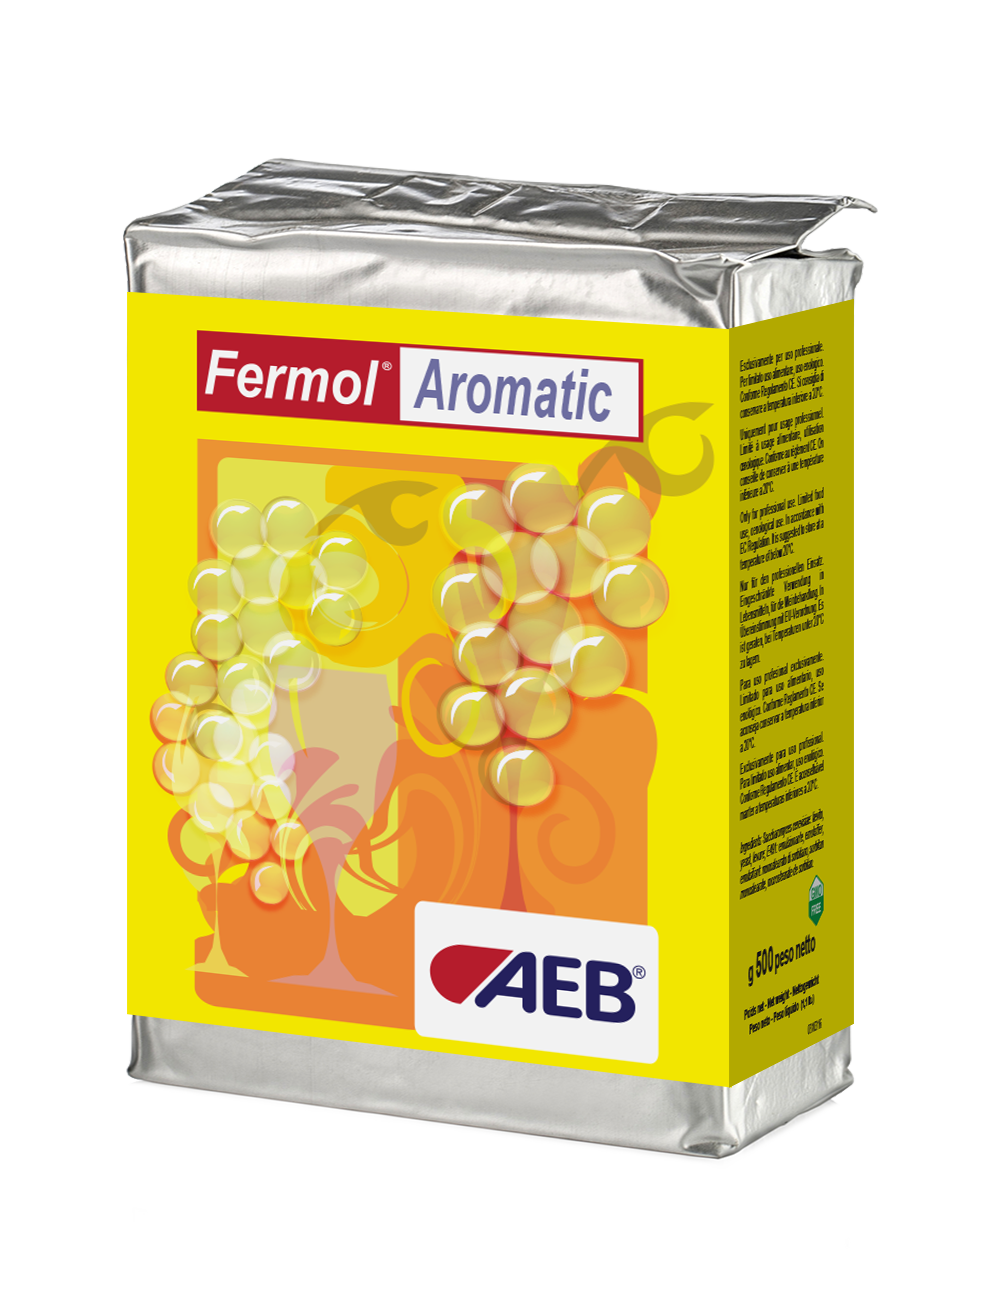 FERMOL Aromatic